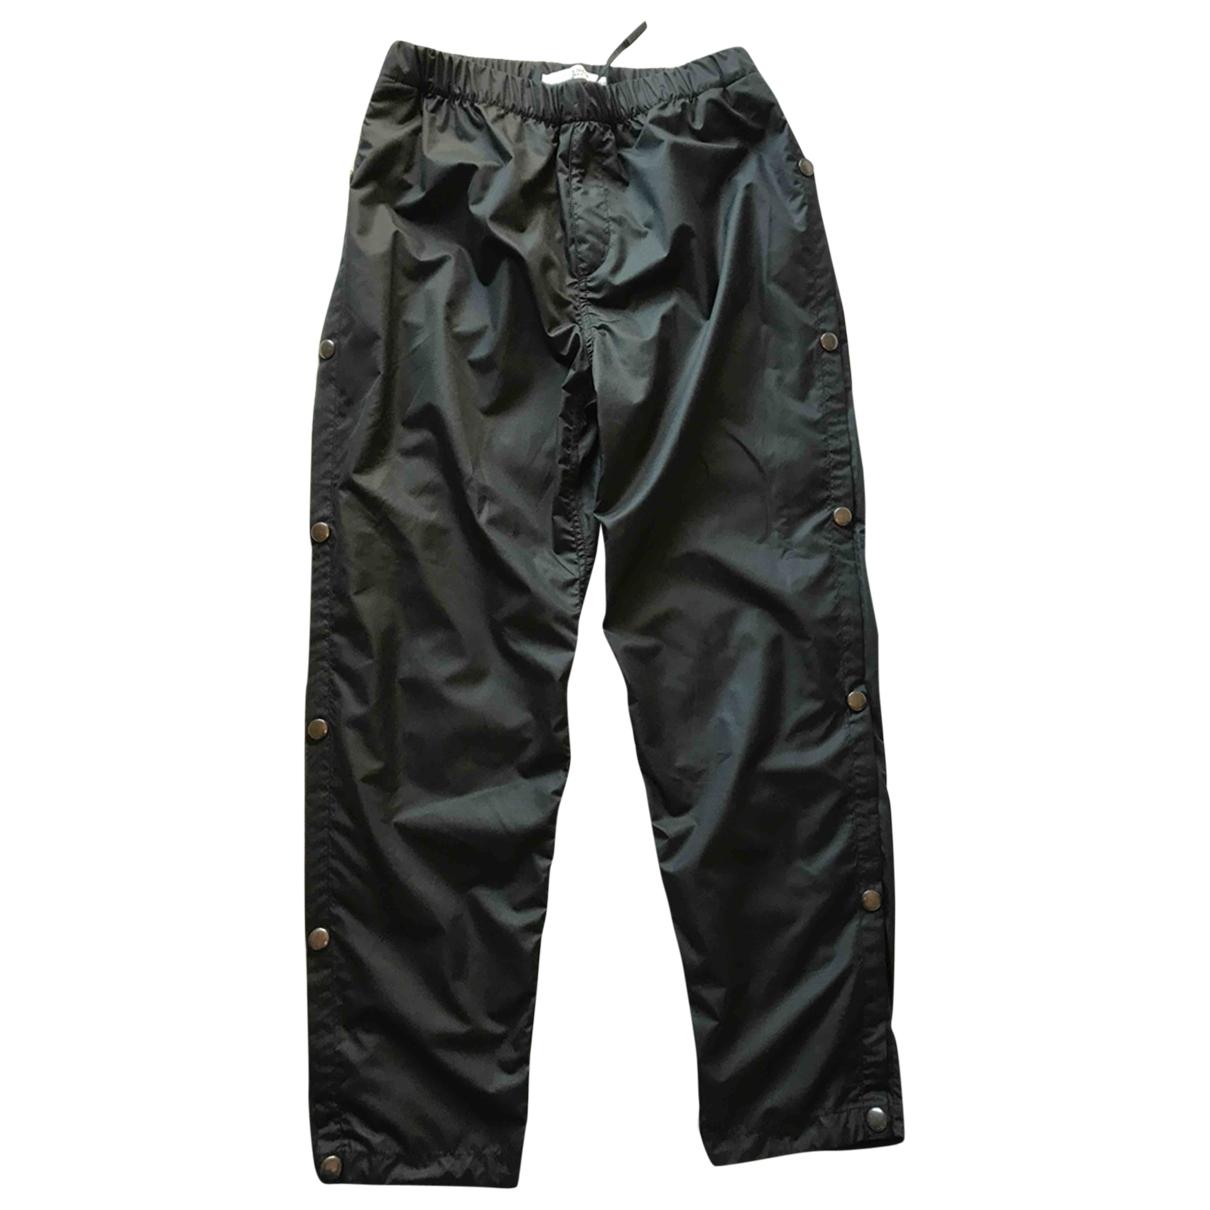 Pantalones Negro Givenchy